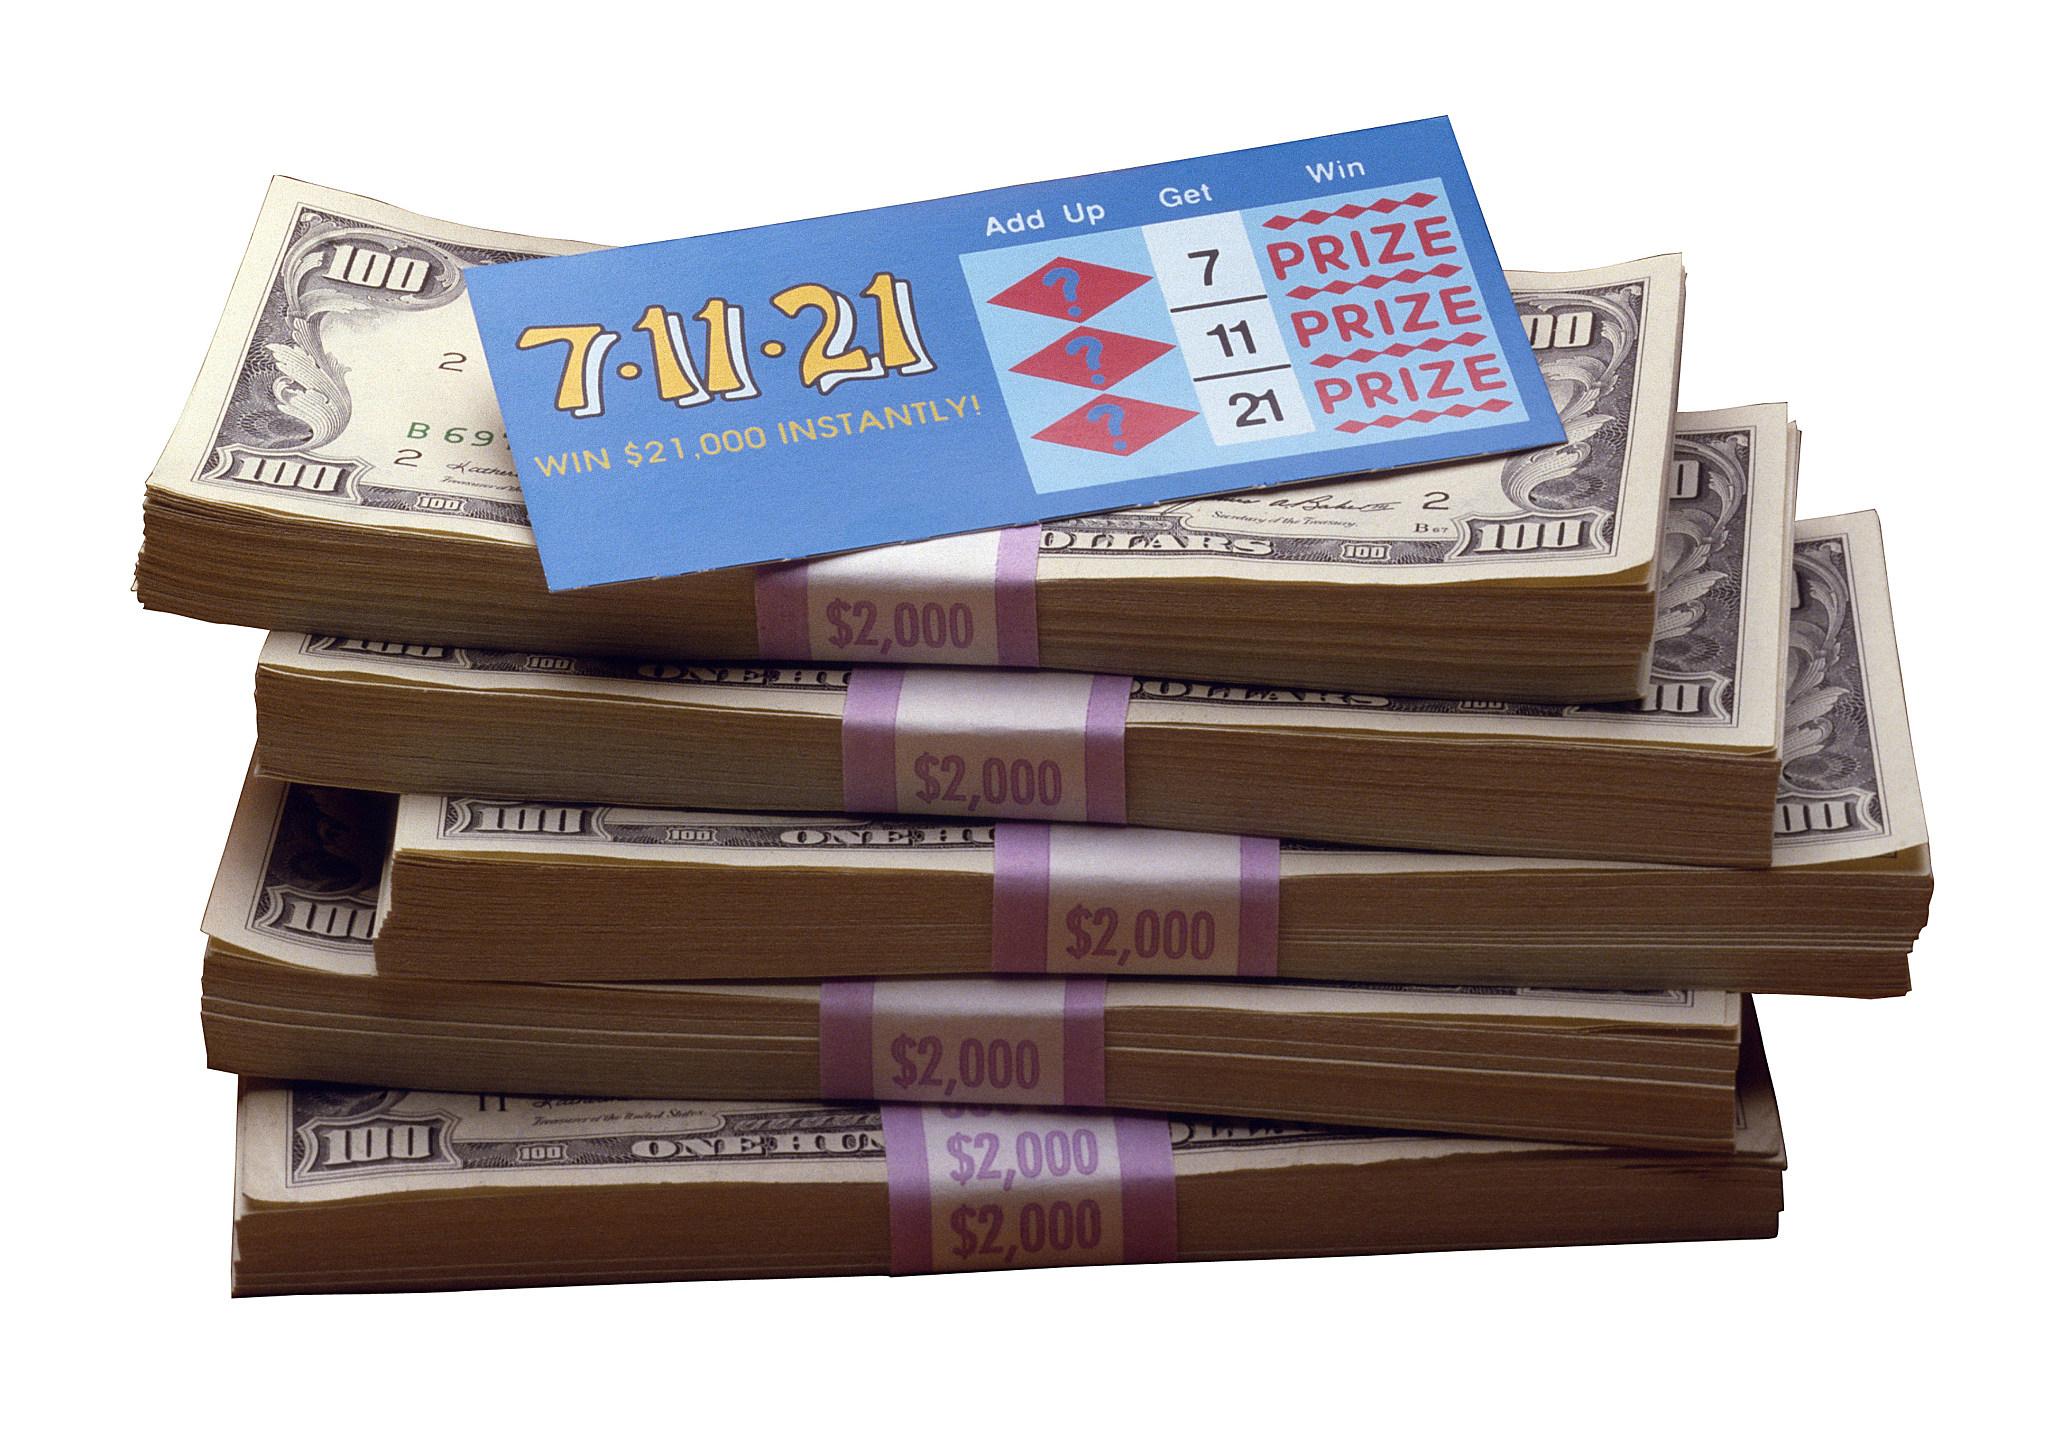 Unclaimed Winning Lotto Ticket Sold In Rockford Worth $350K